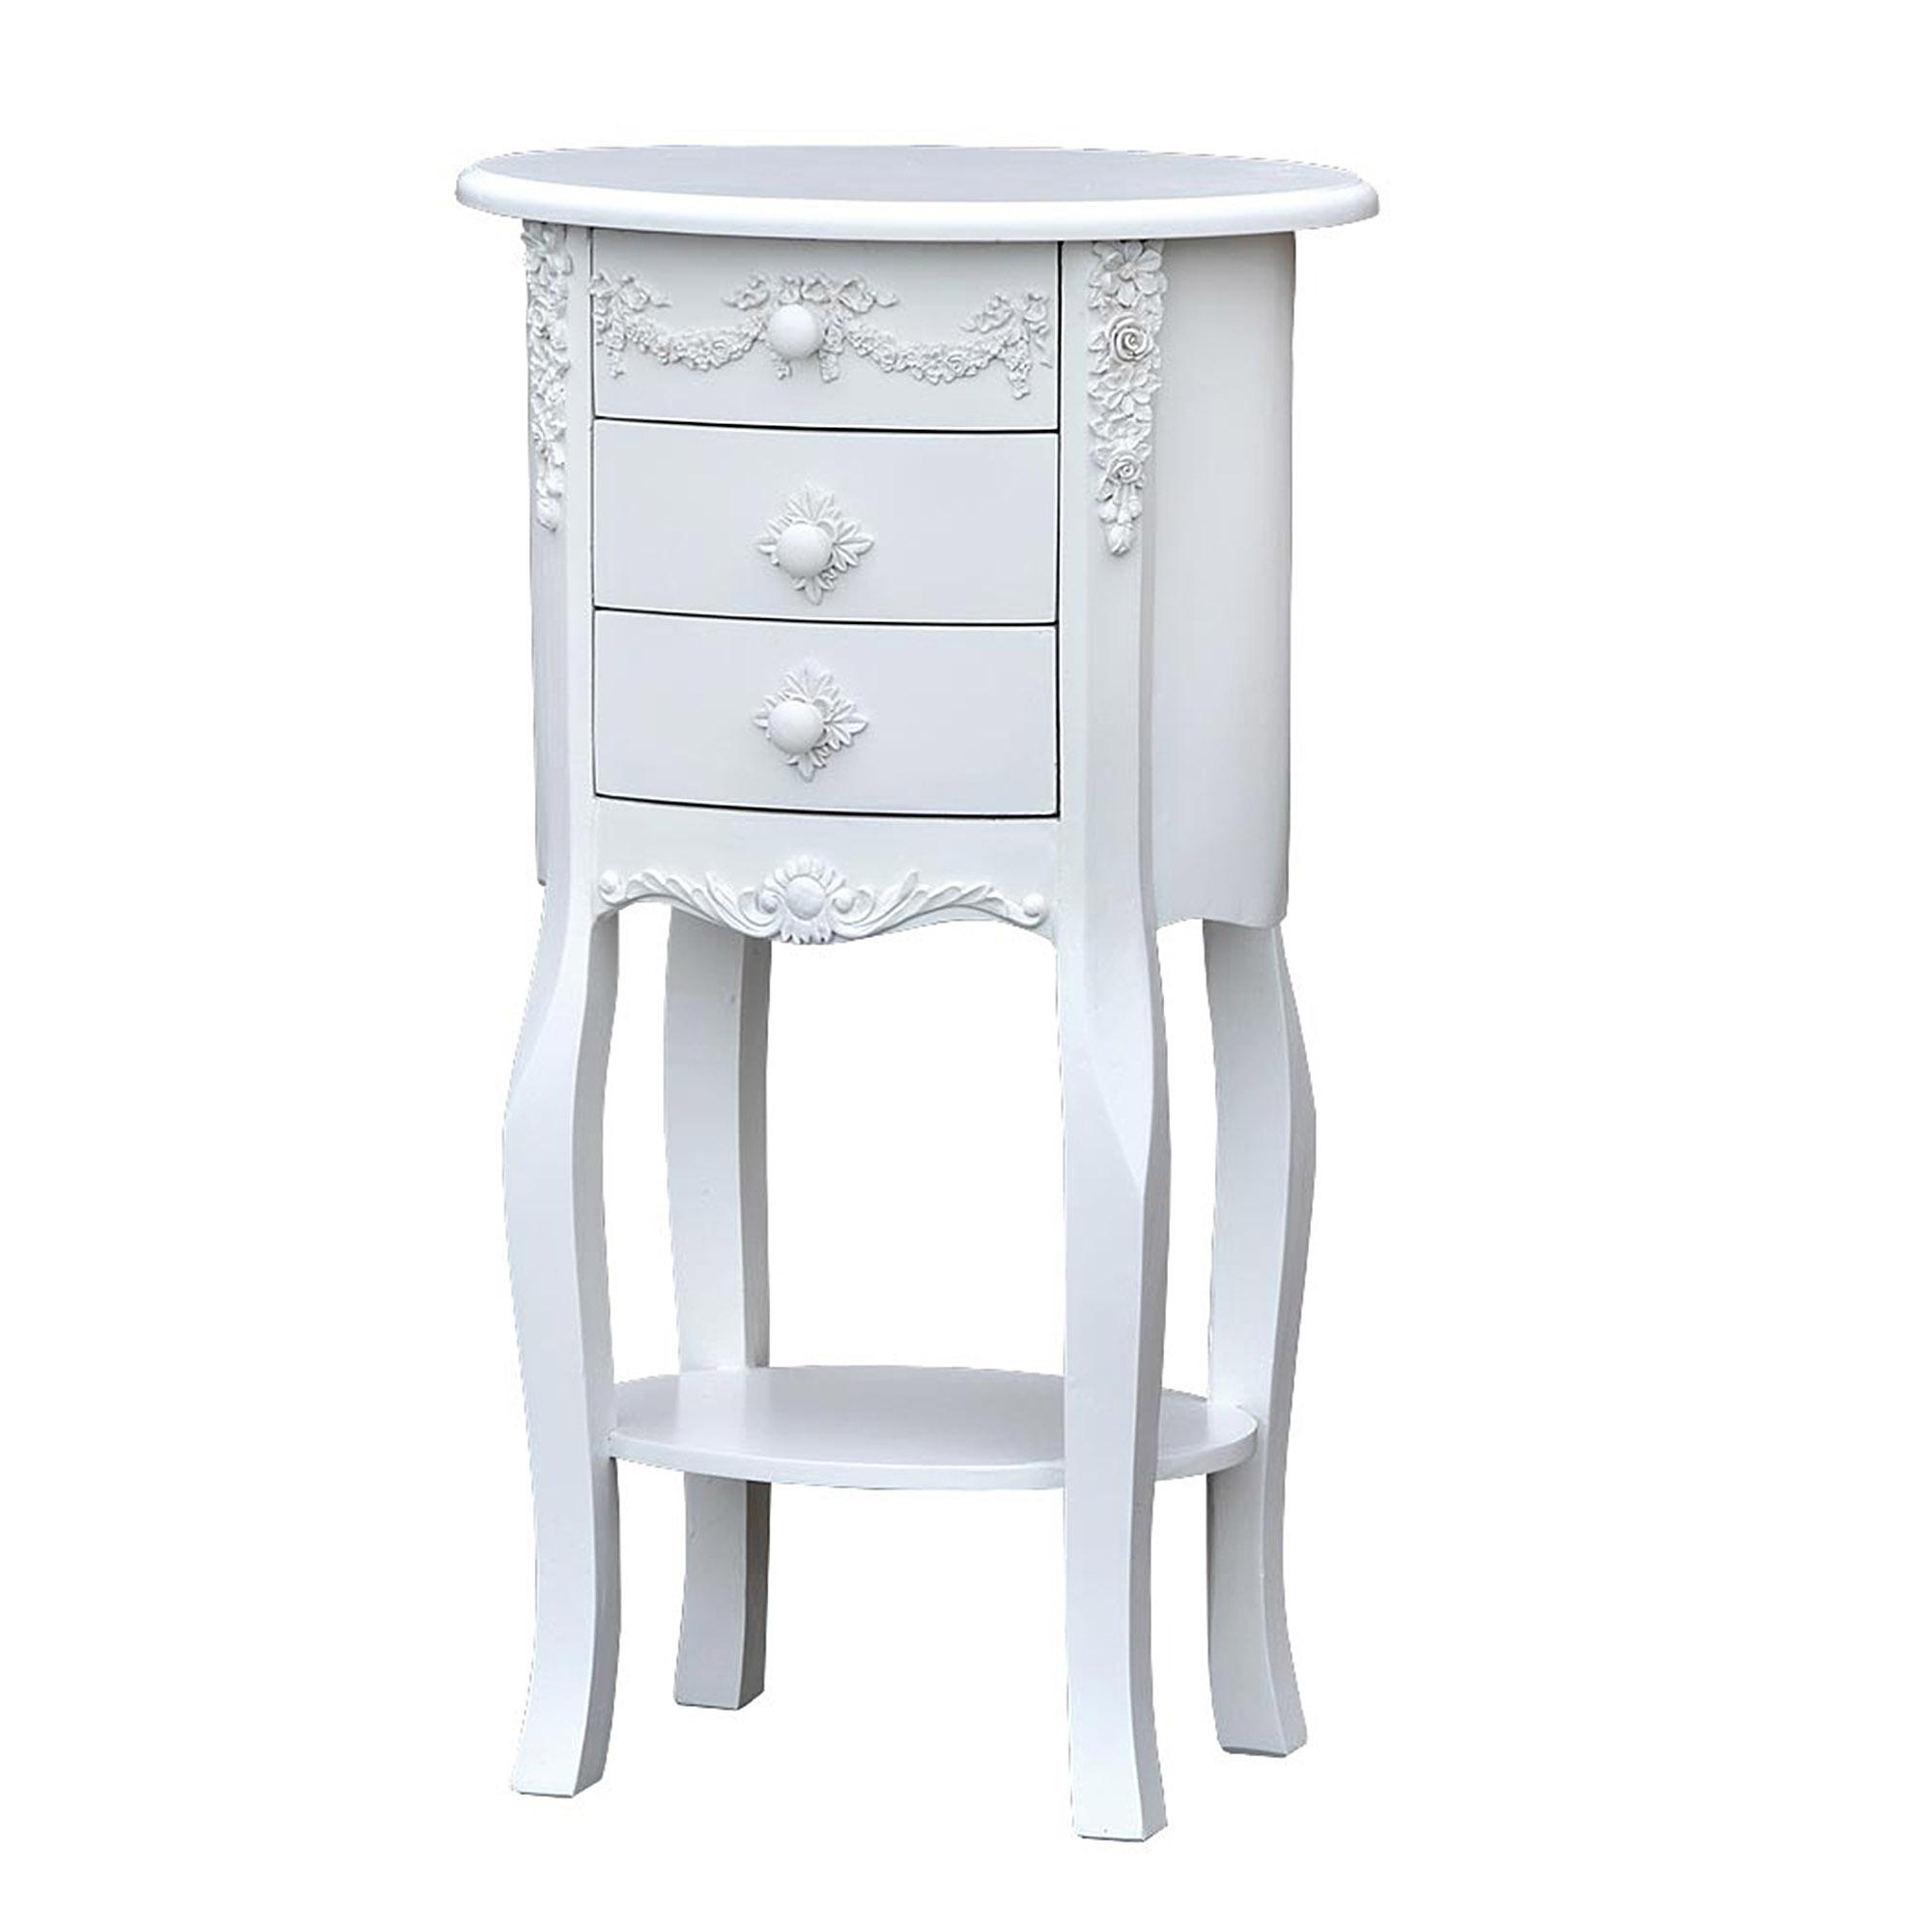 Ornate White Oval Bedside Table Cabinet